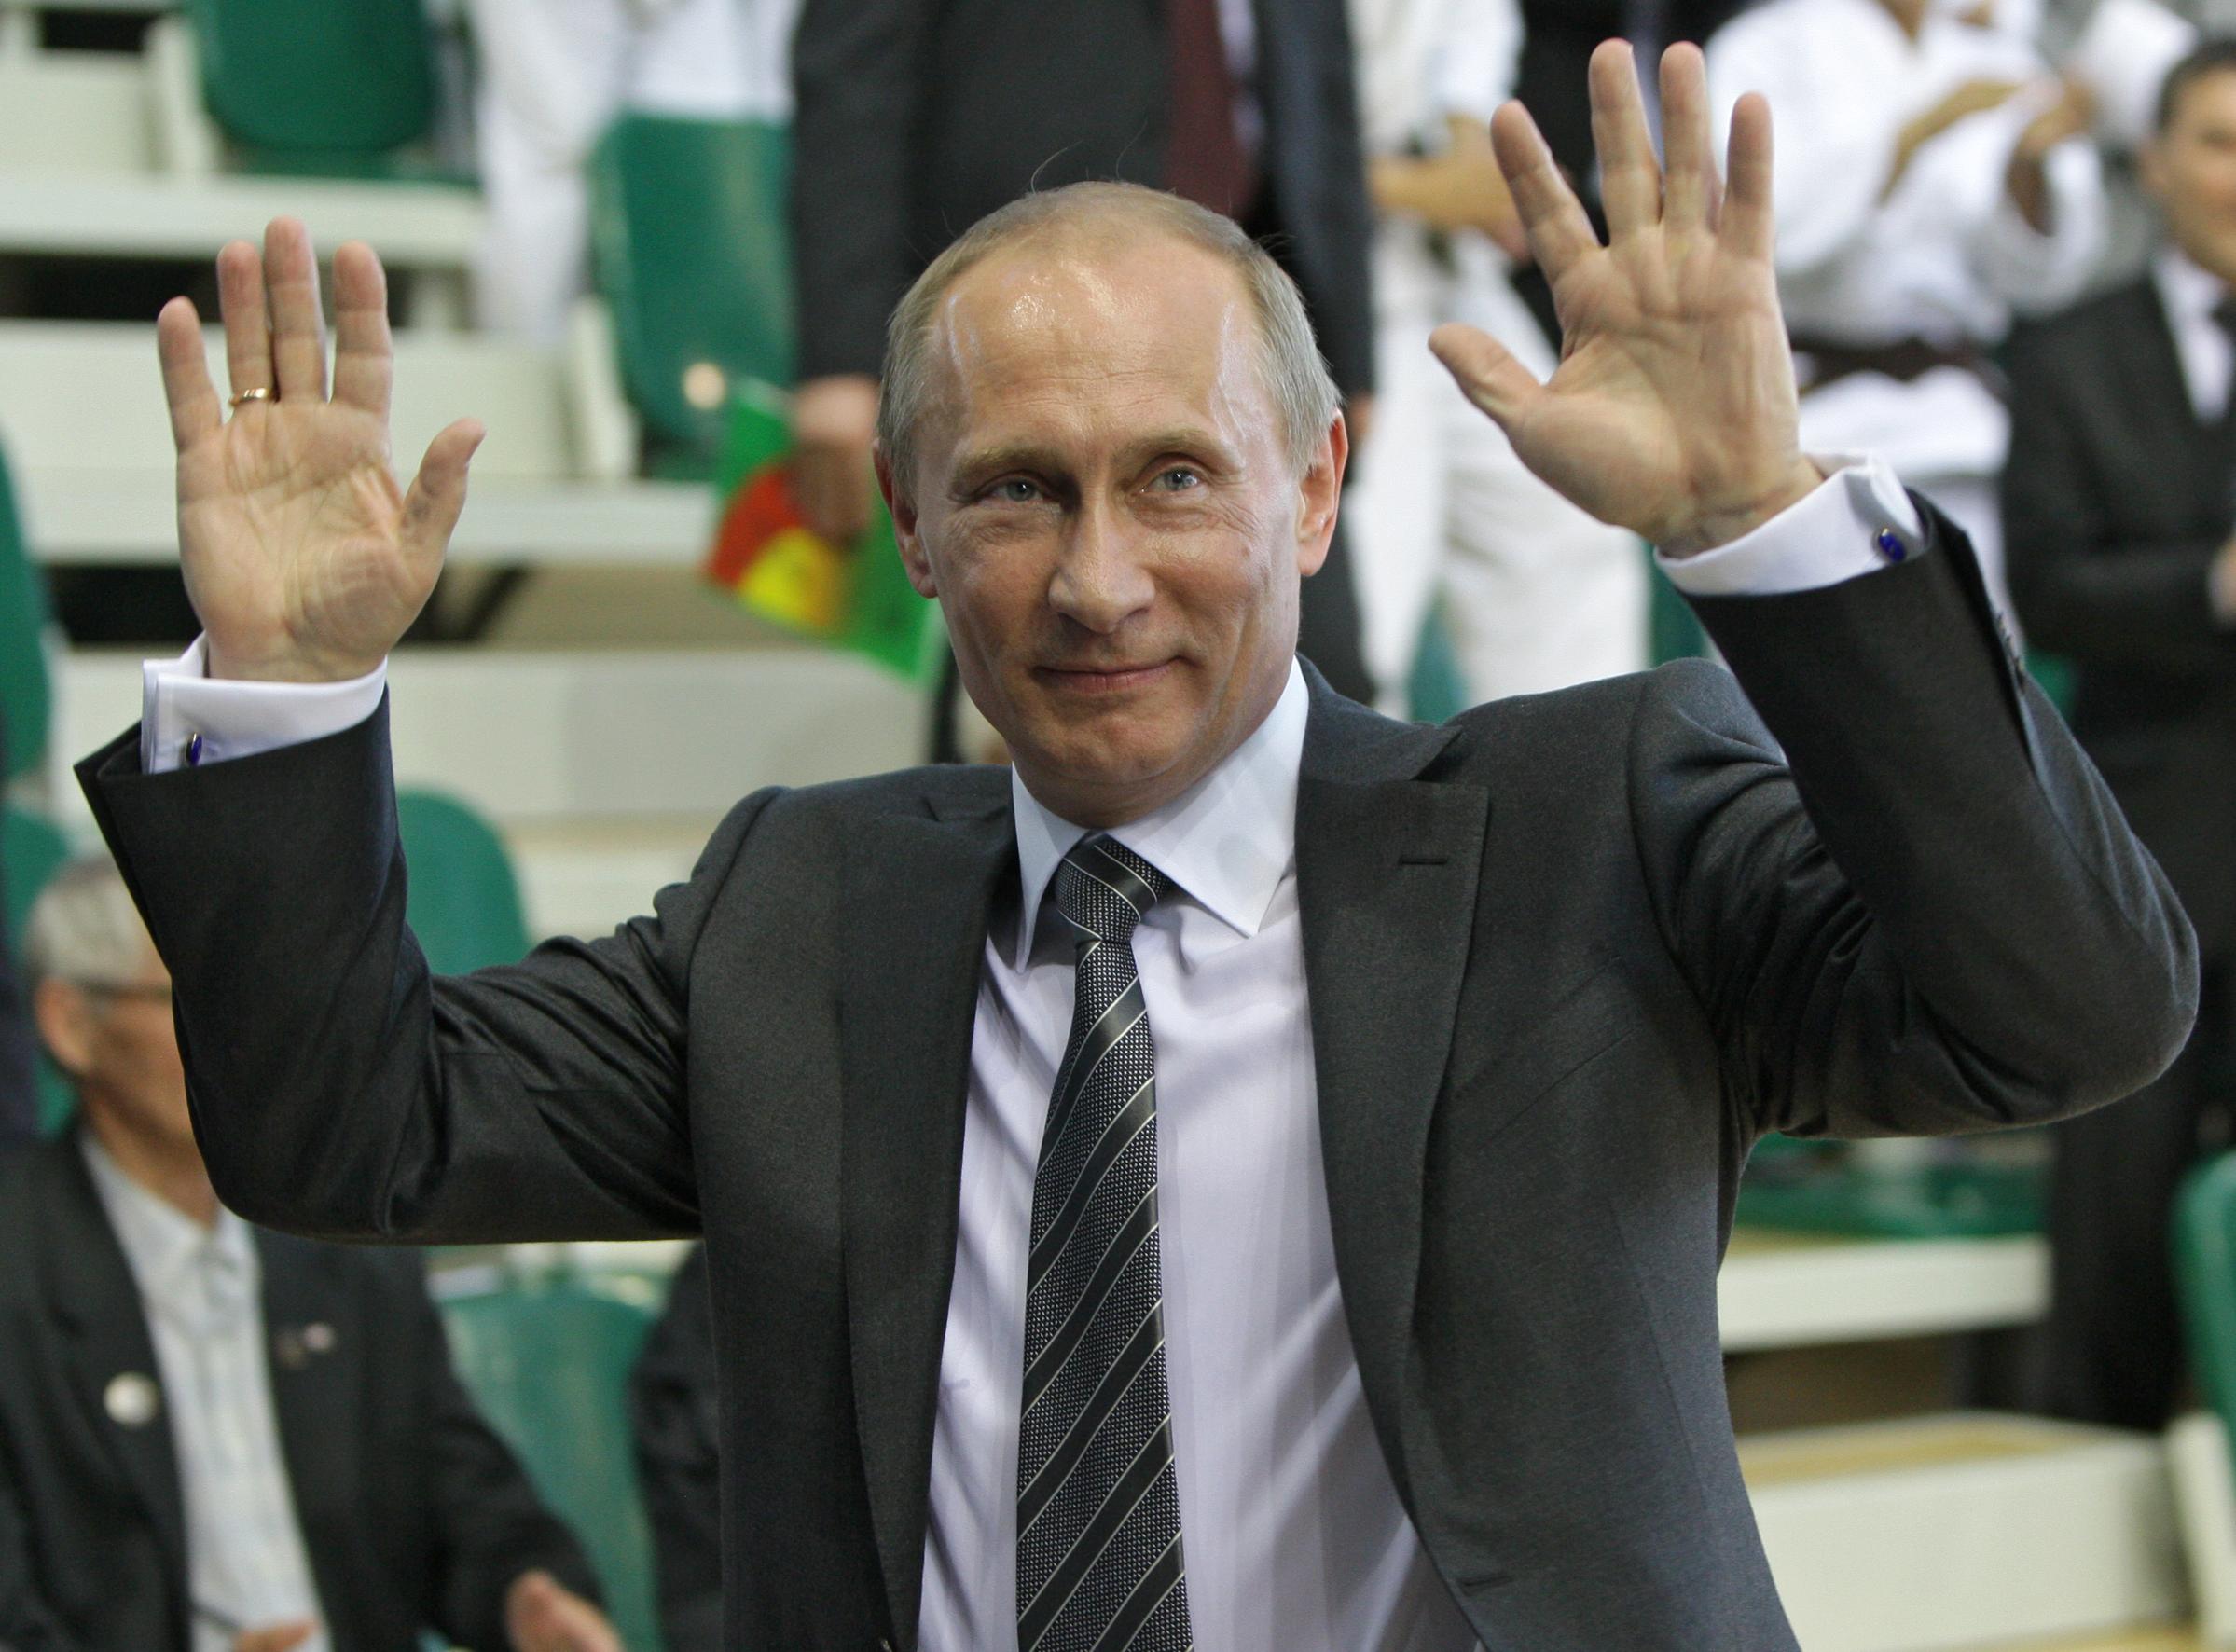 Фото: Пресс-служба правительства РФ